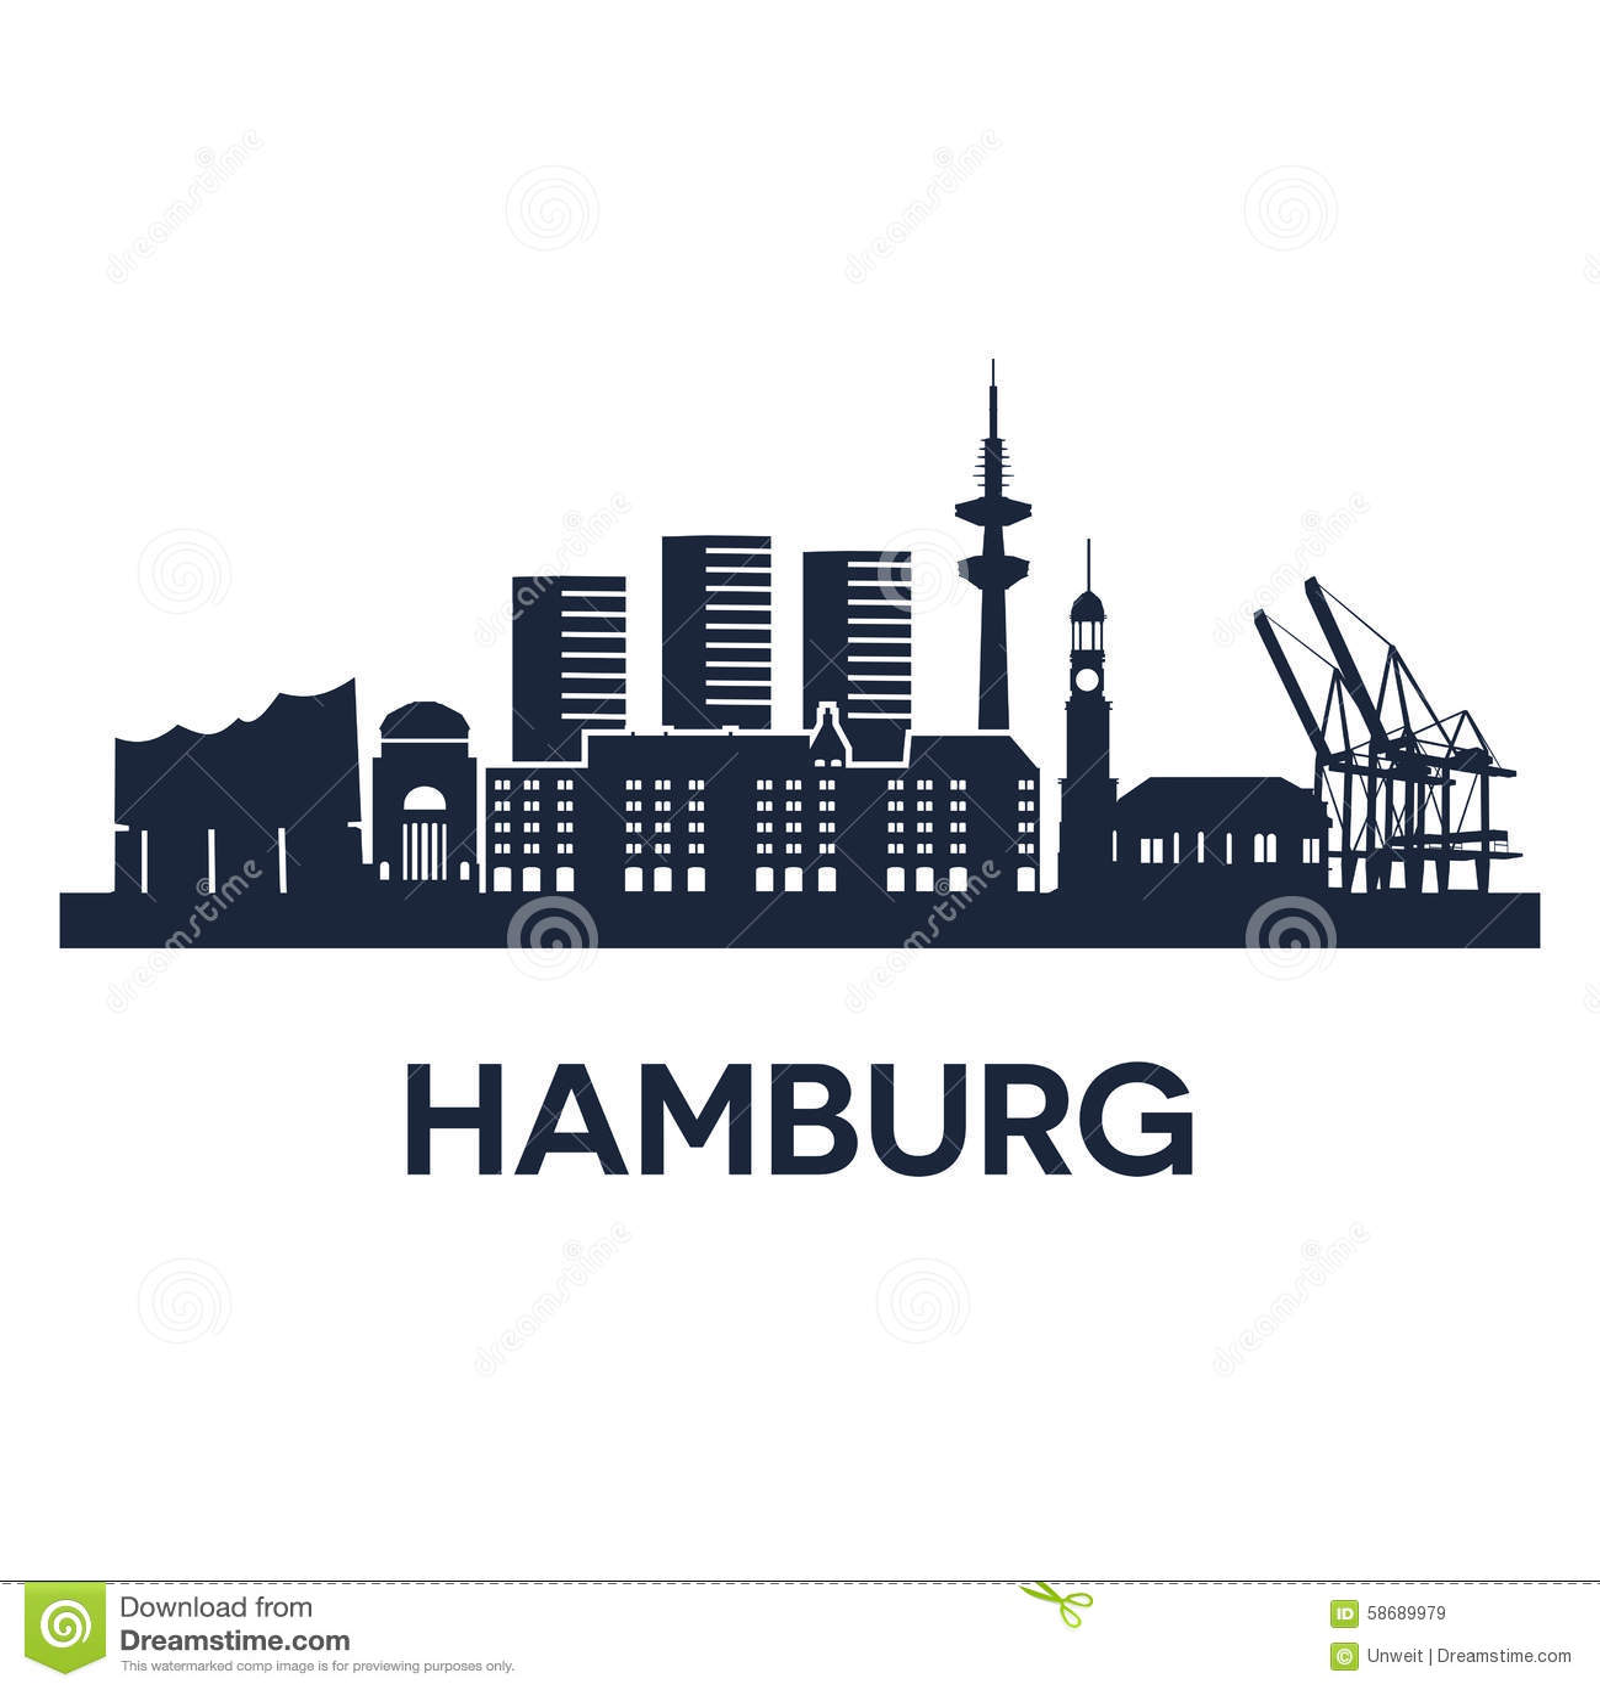 hamburg vektor abbildung illustration von symbol himmel. Black Bedroom Furniture Sets. Home Design Ideas